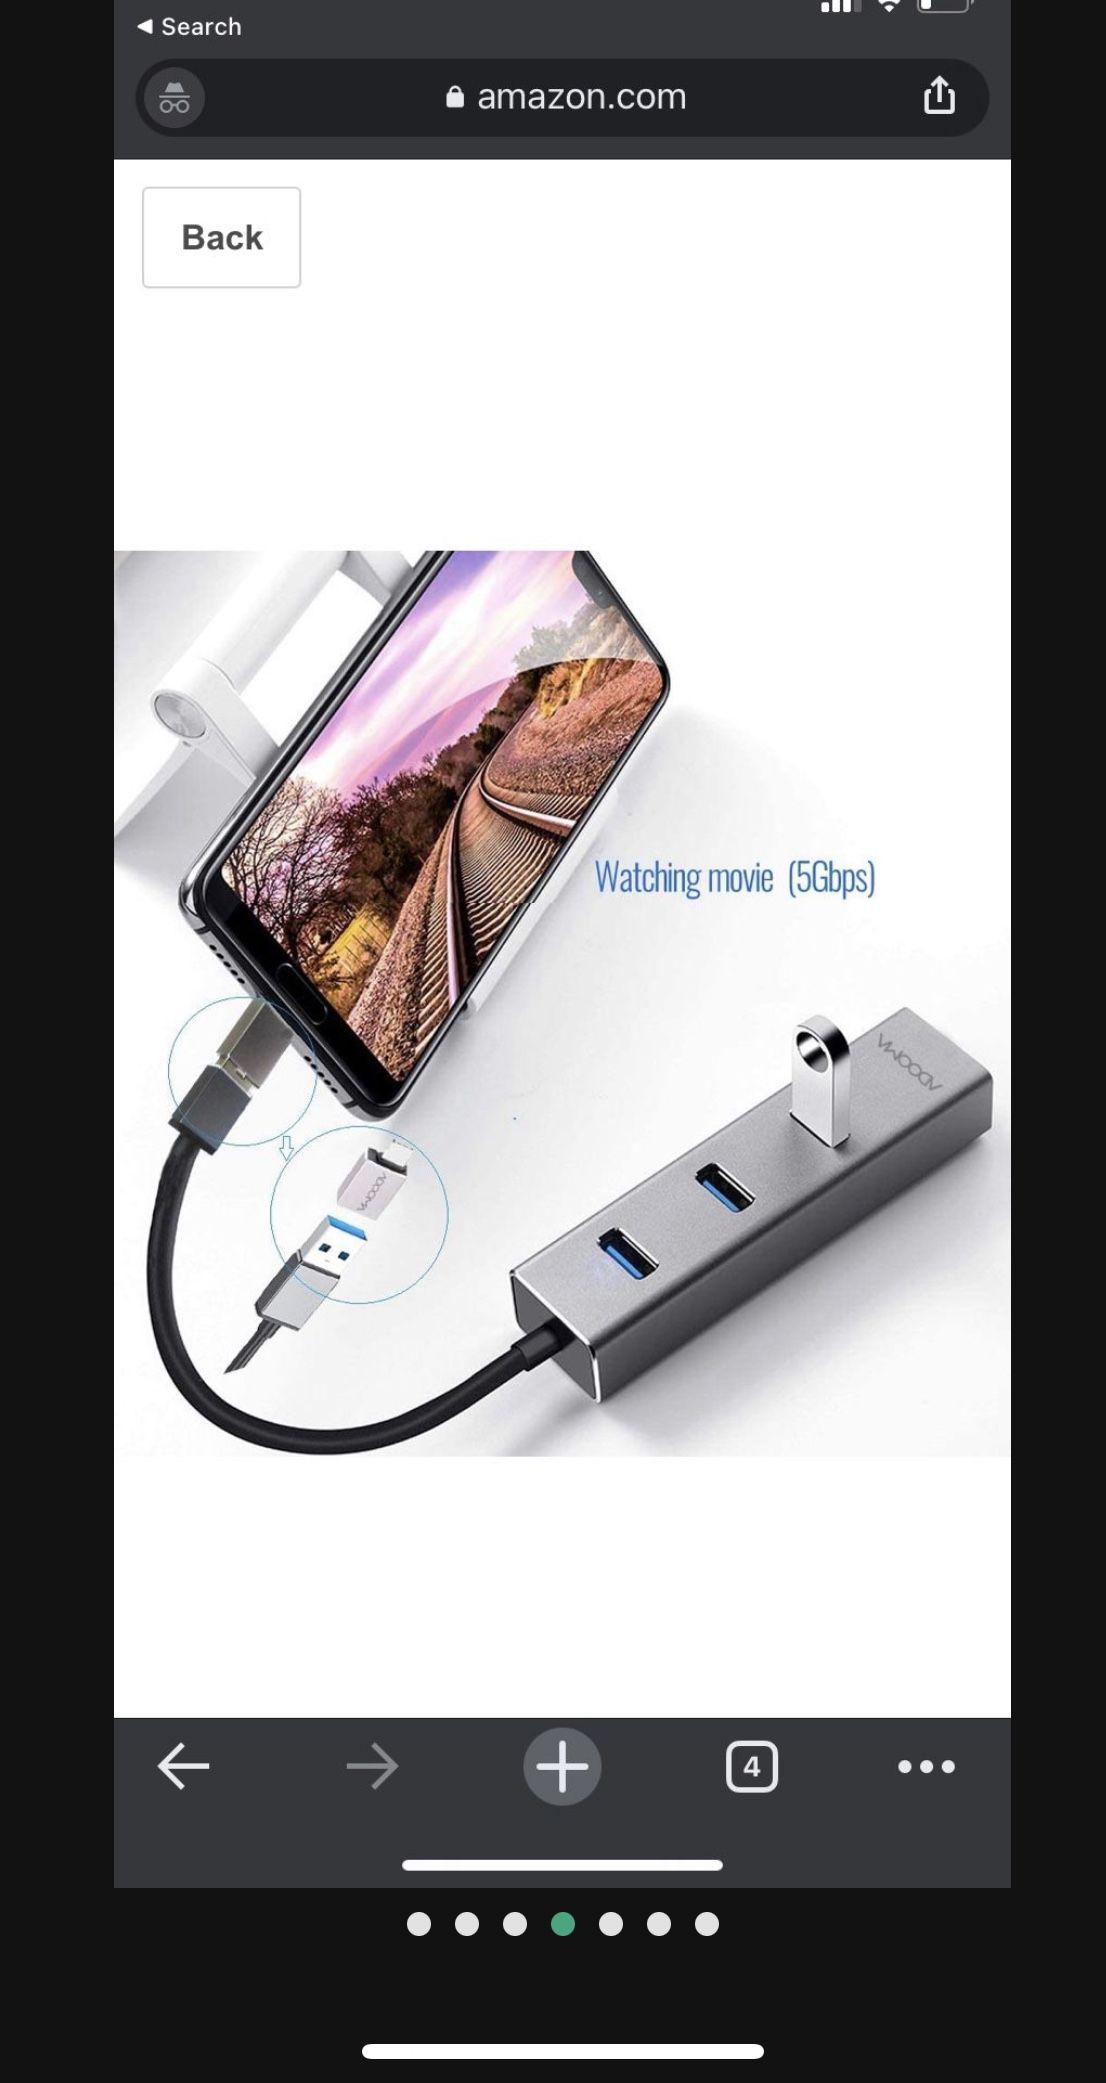 USB 3.0 Hub to Ethernet RJ45 LAN Adapter,ADOOMA Gigabit 1000Mbps USB C Ethernet Adapter for Chromebook,Tablets and Phones Grey